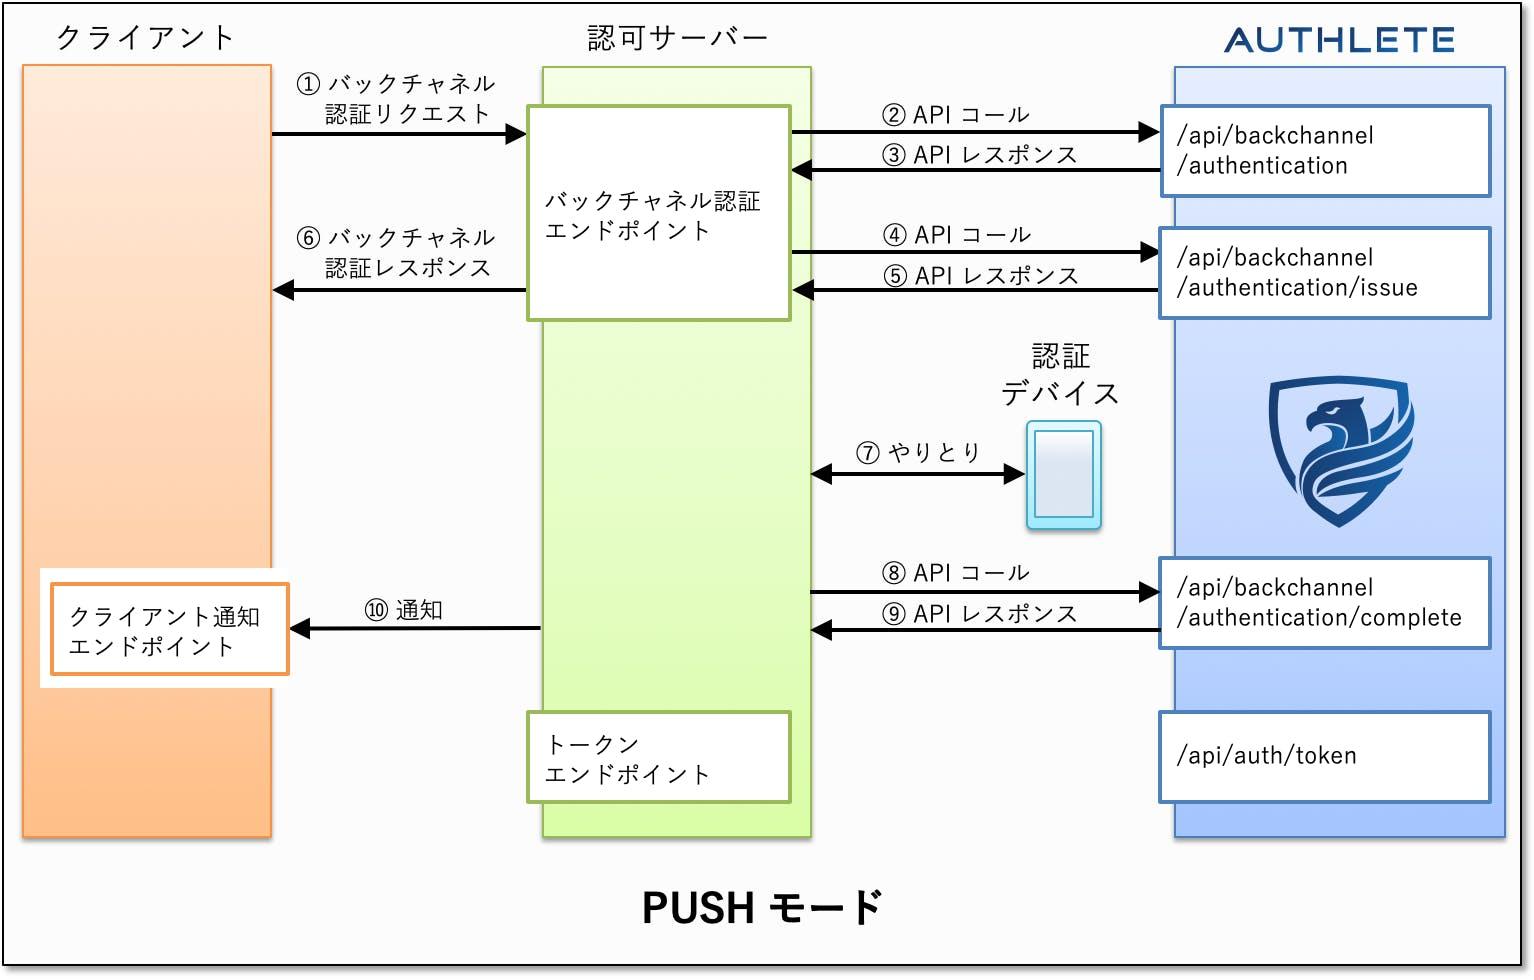 ciba-push-mode-authlete.png